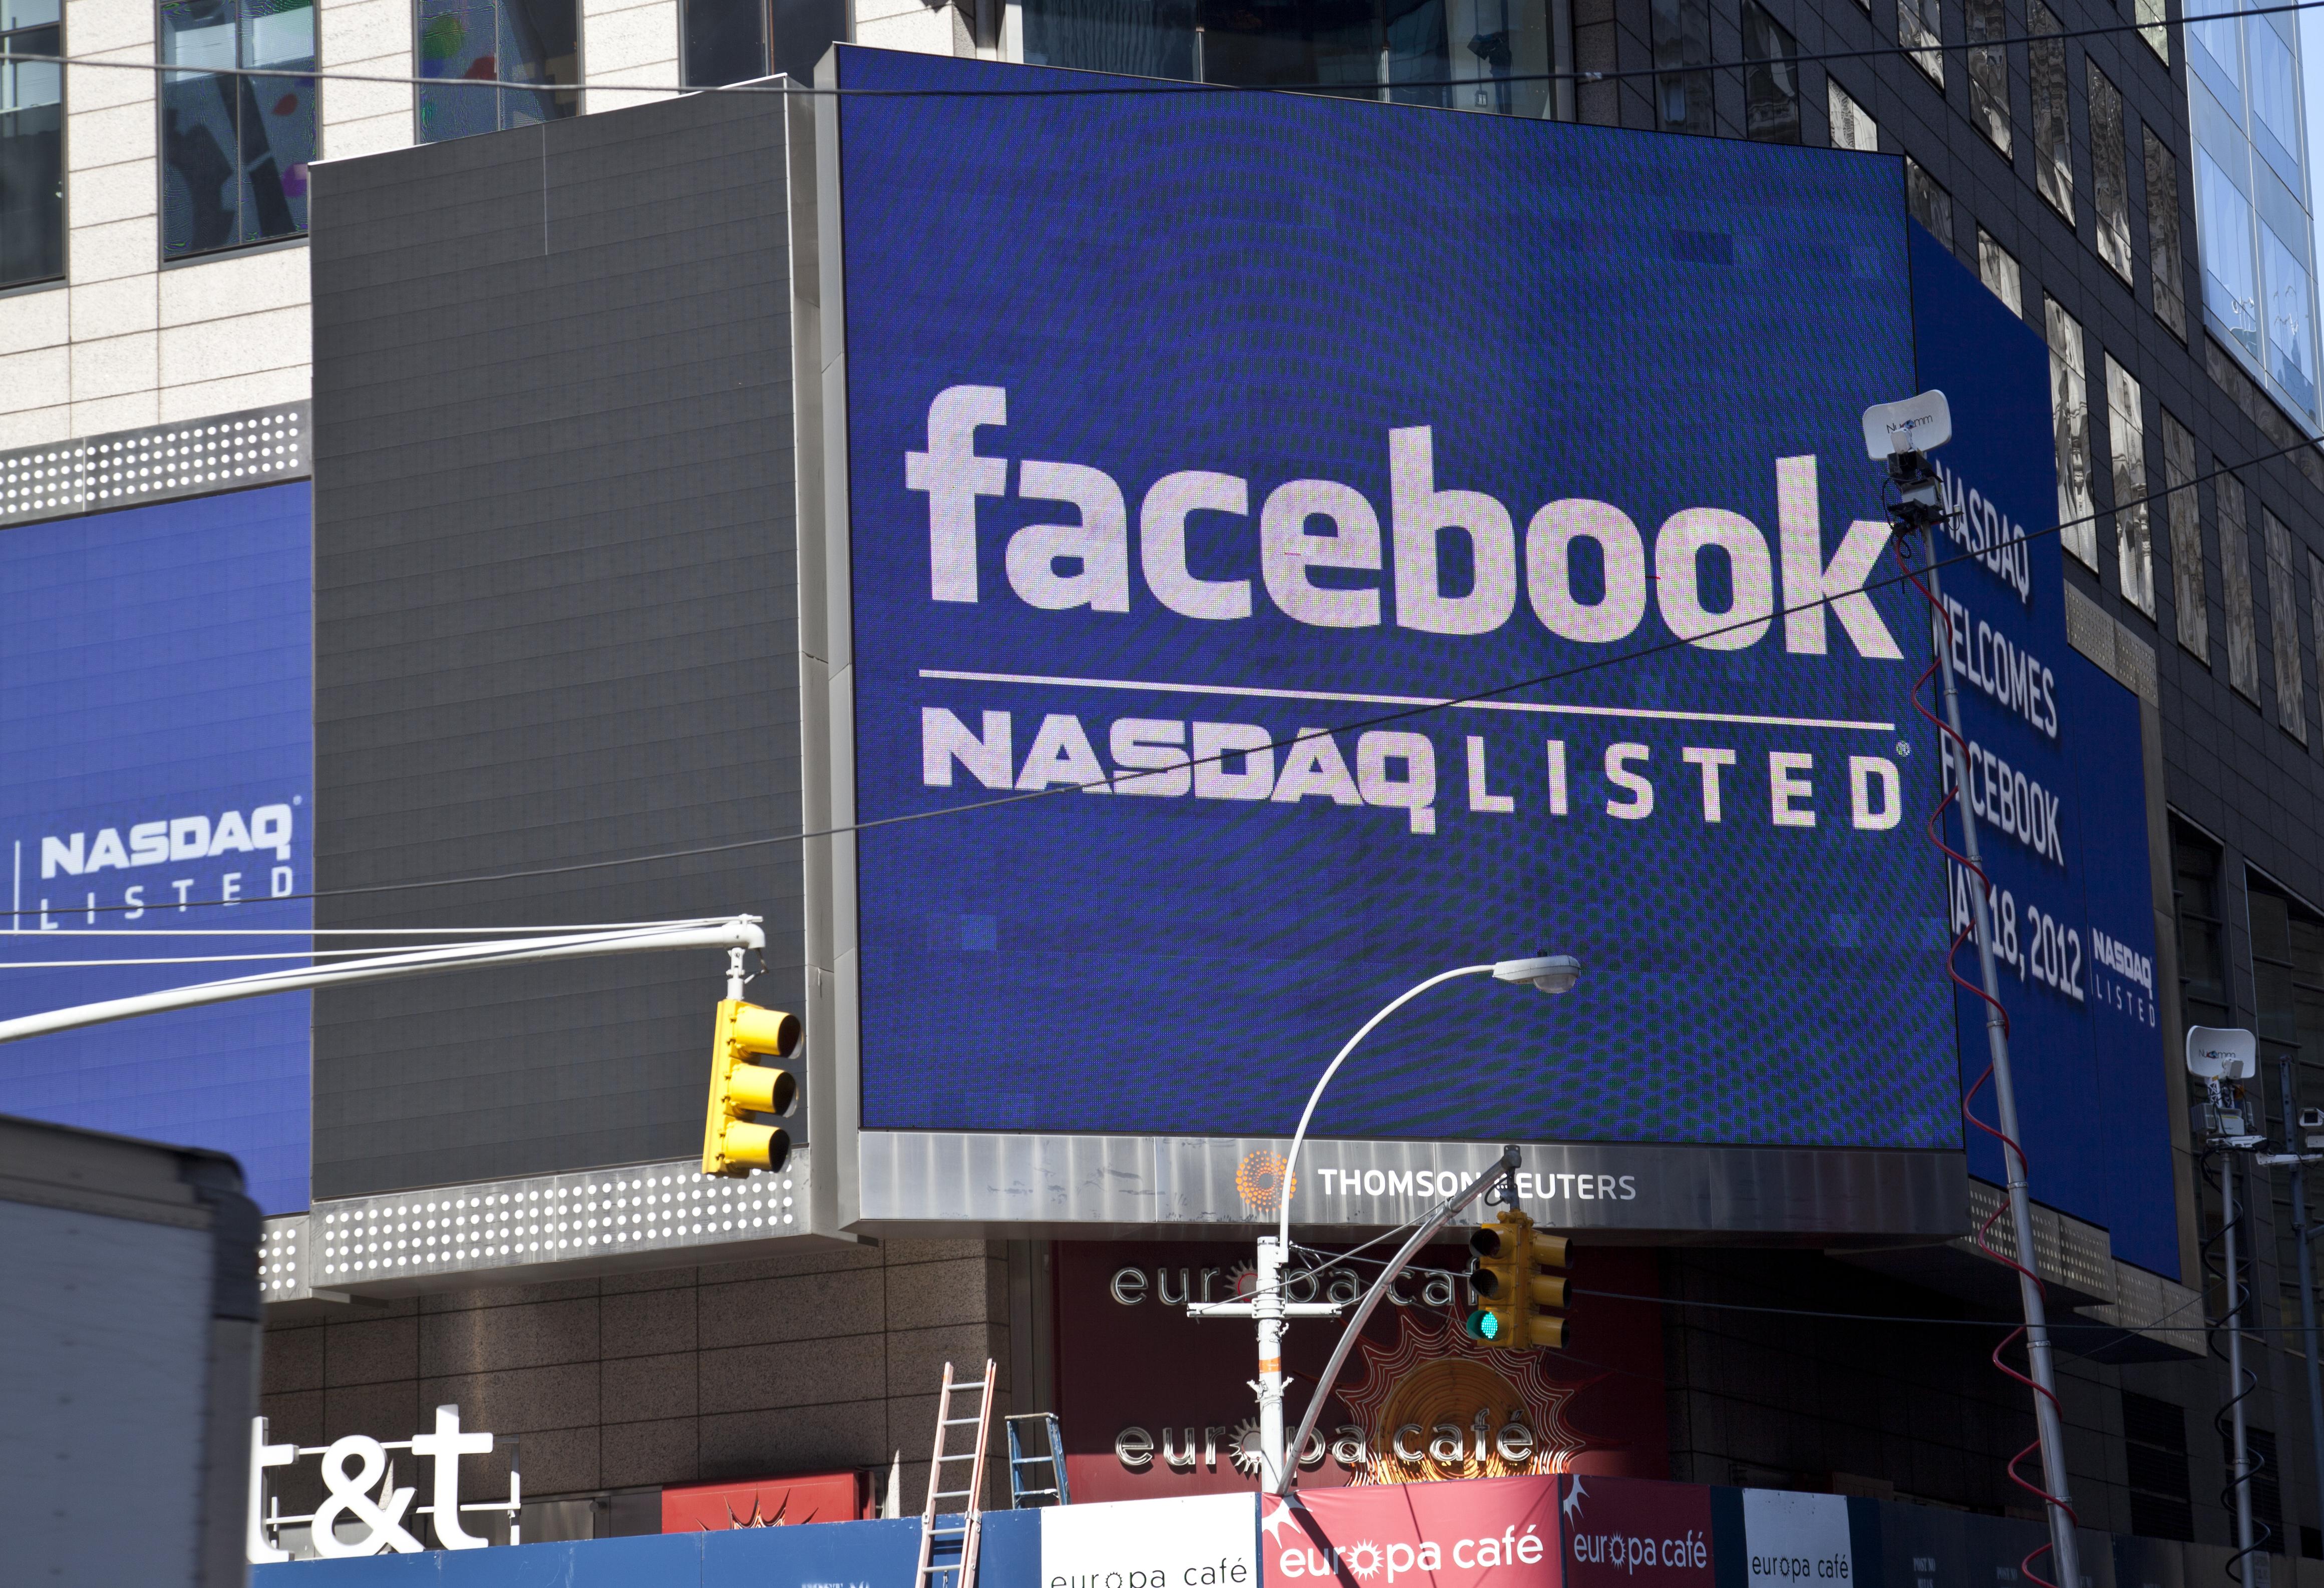 Facebook stock listing announcement